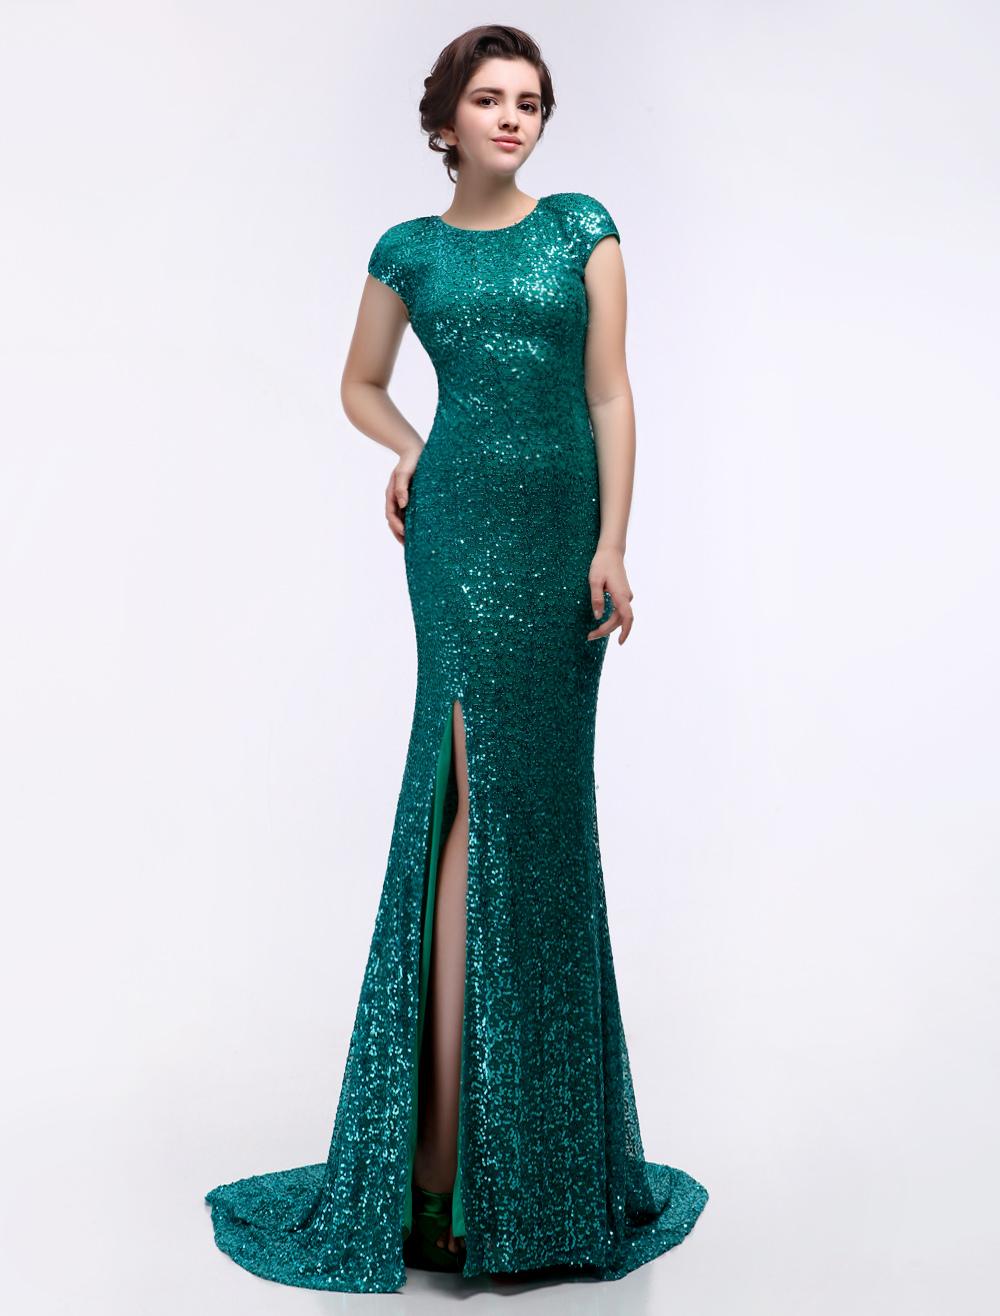 c91e8f8de96 Dark Green Sequined Split Mermaid Prom Dress - Milanoo.com